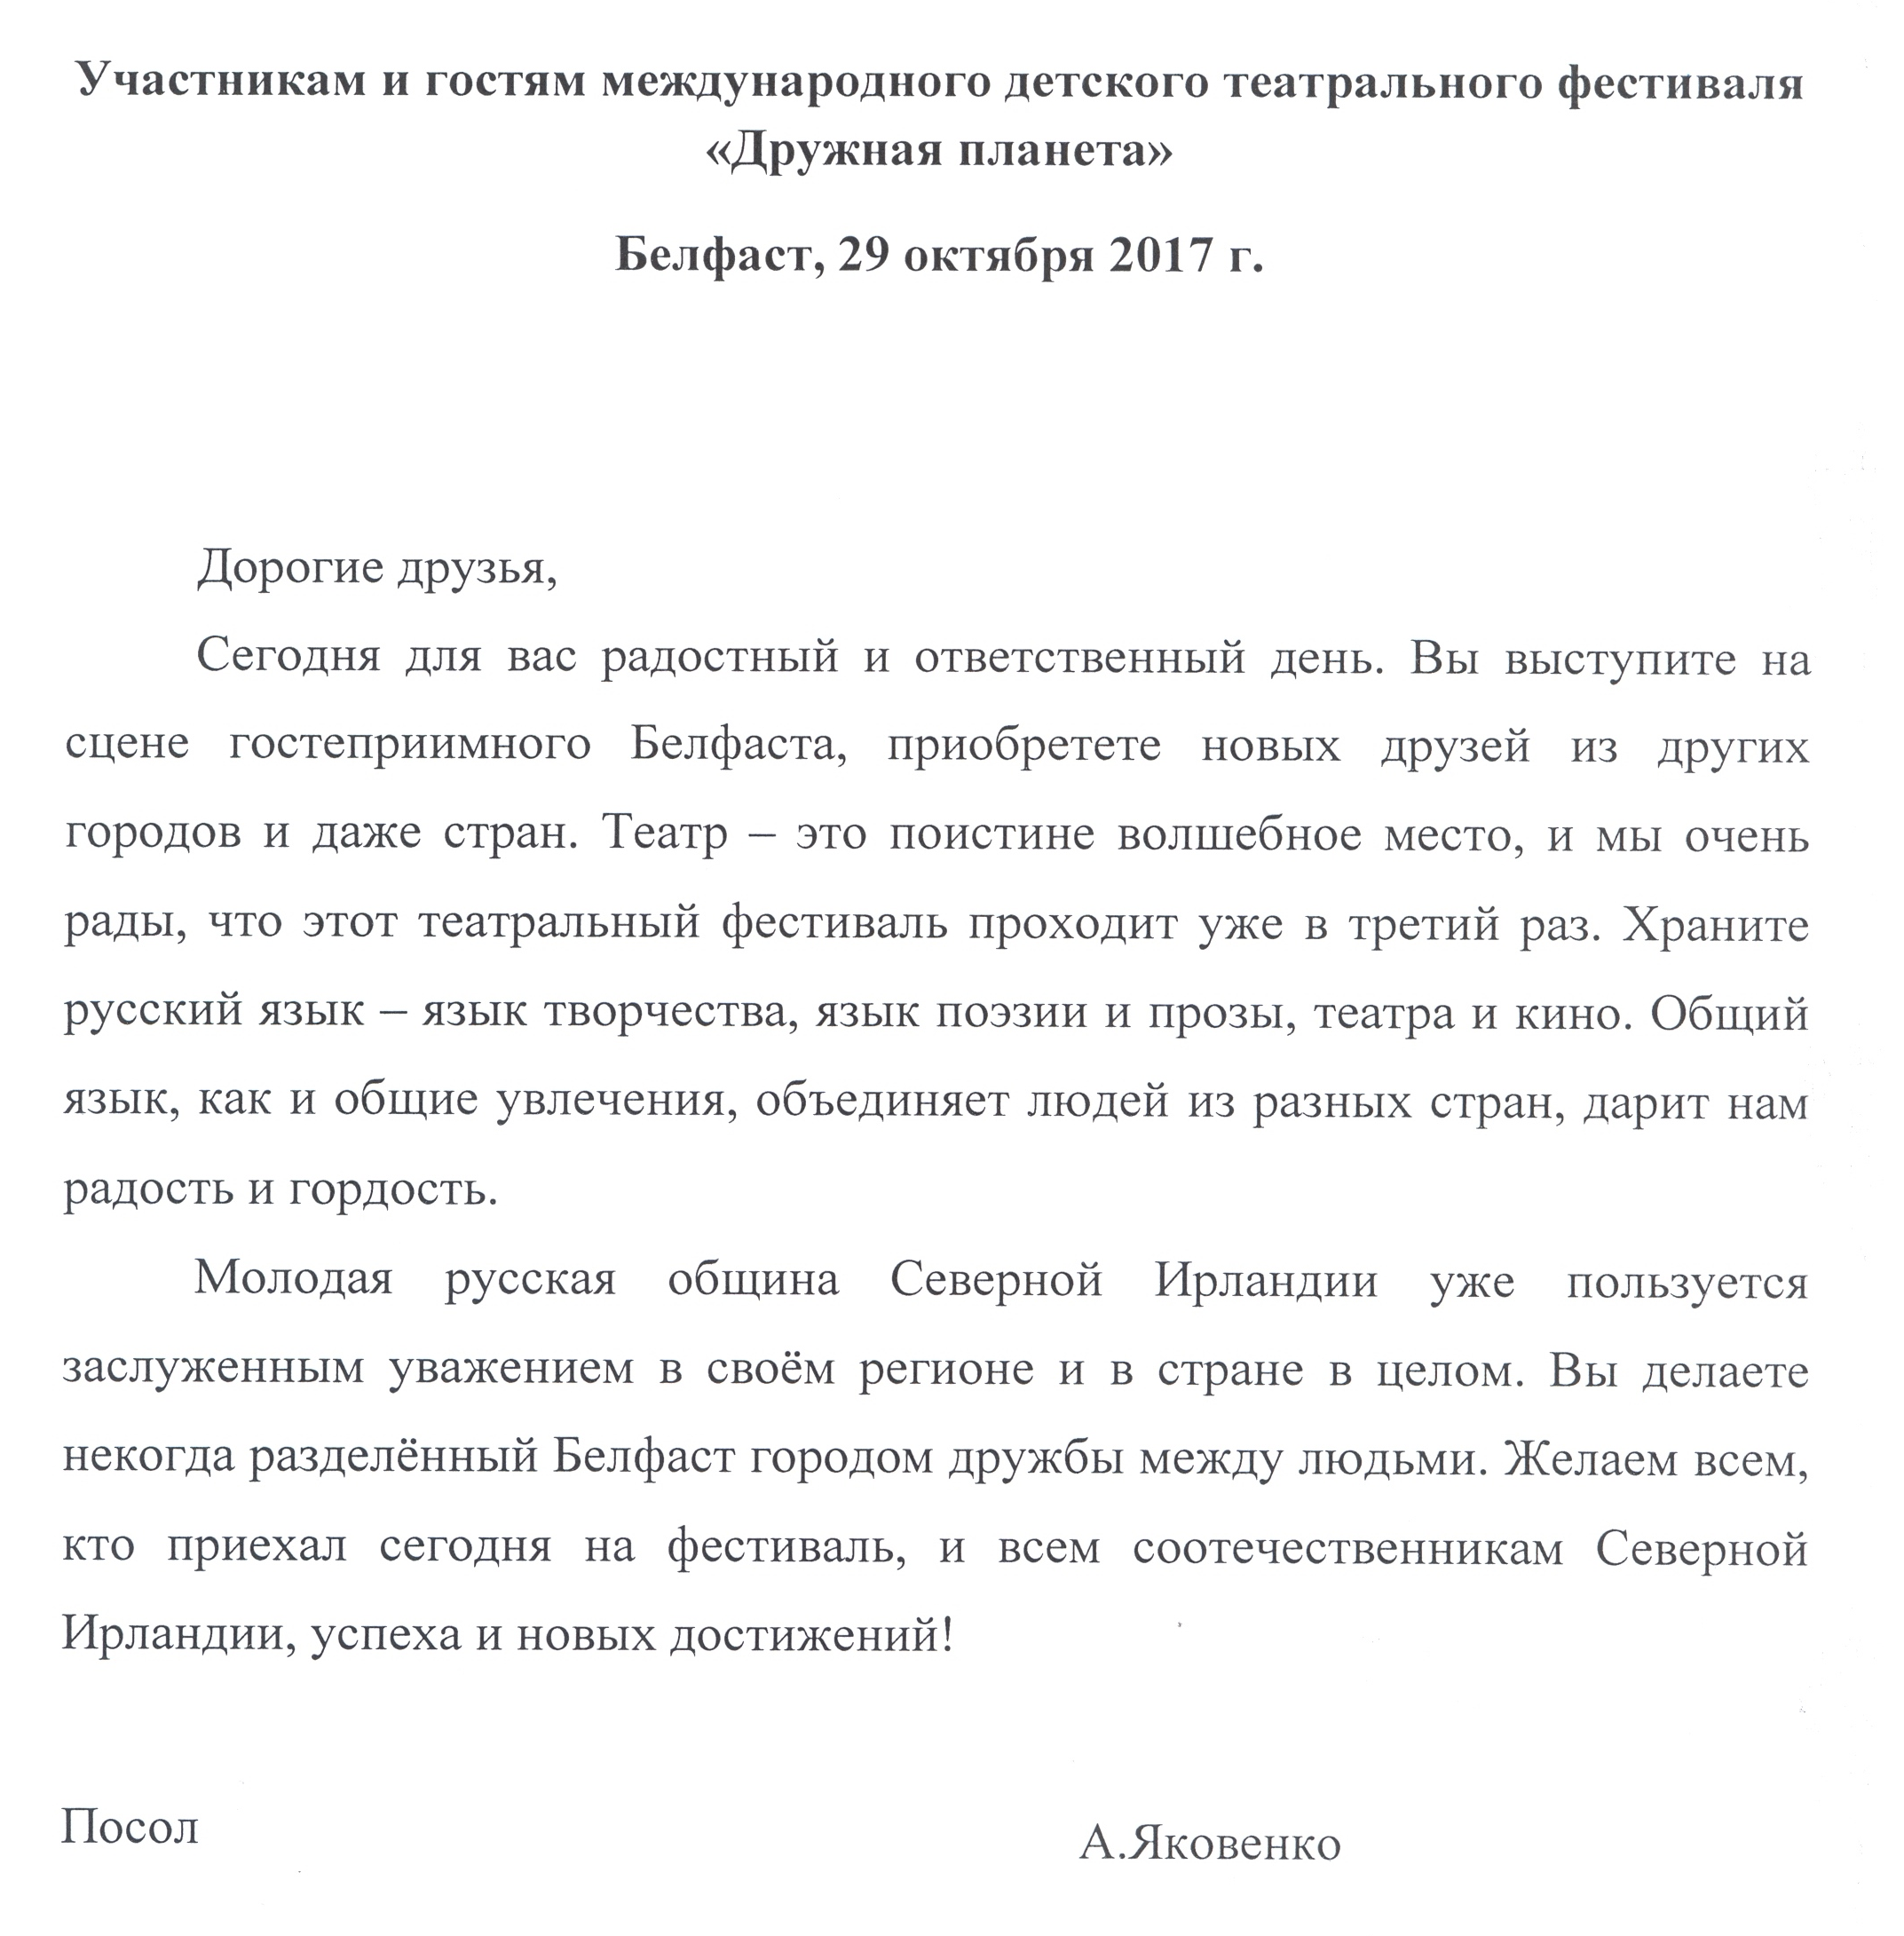 посол Яковенко.png